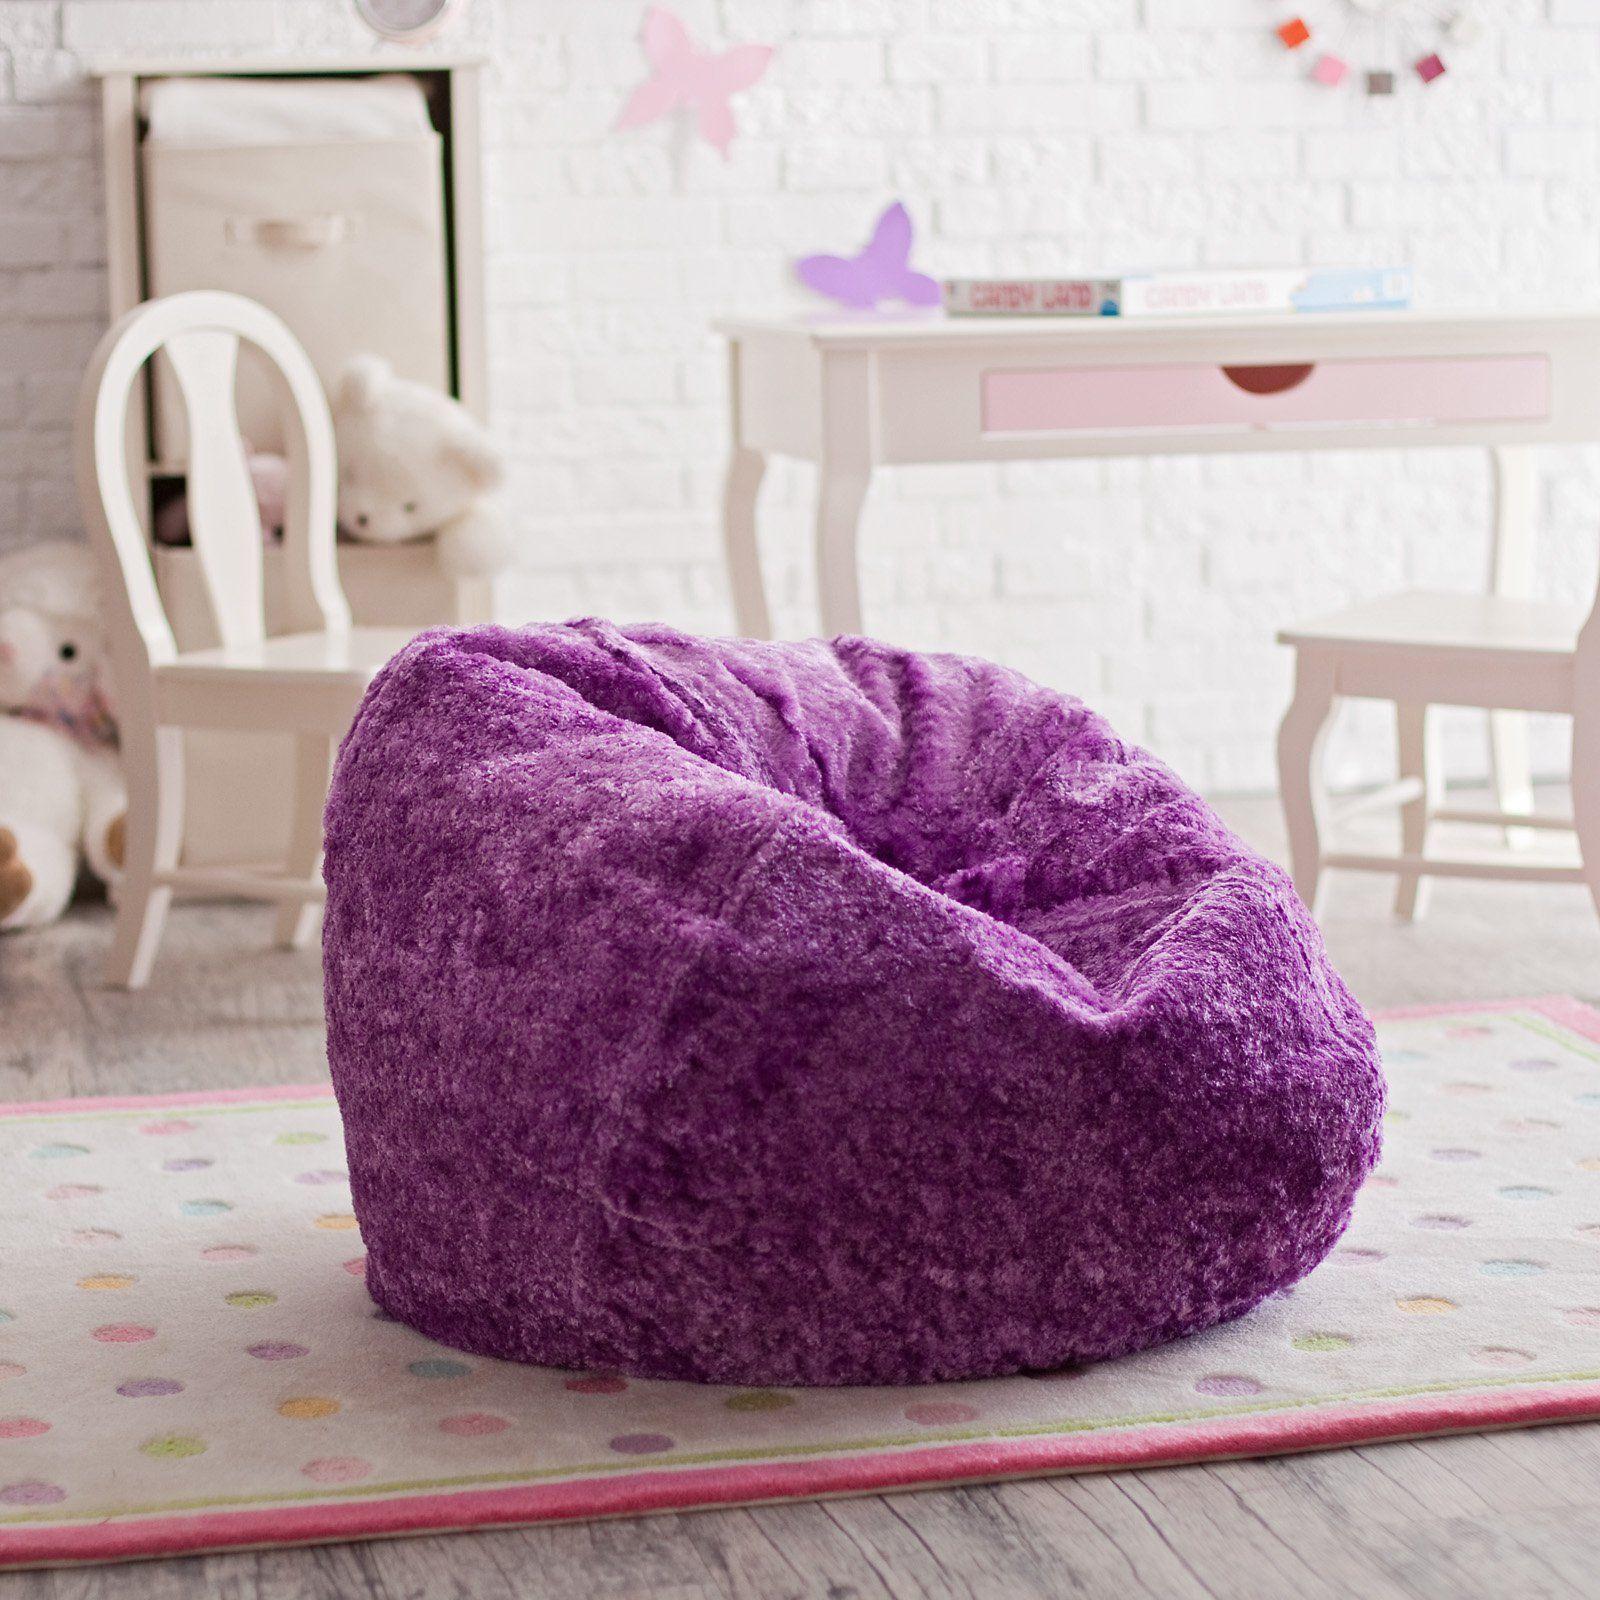 Astounding Ace Casual Furniture Small Chenille Lounger Bean Bag Chair Home Interior And Landscaping Mentranervesignezvosmurscom